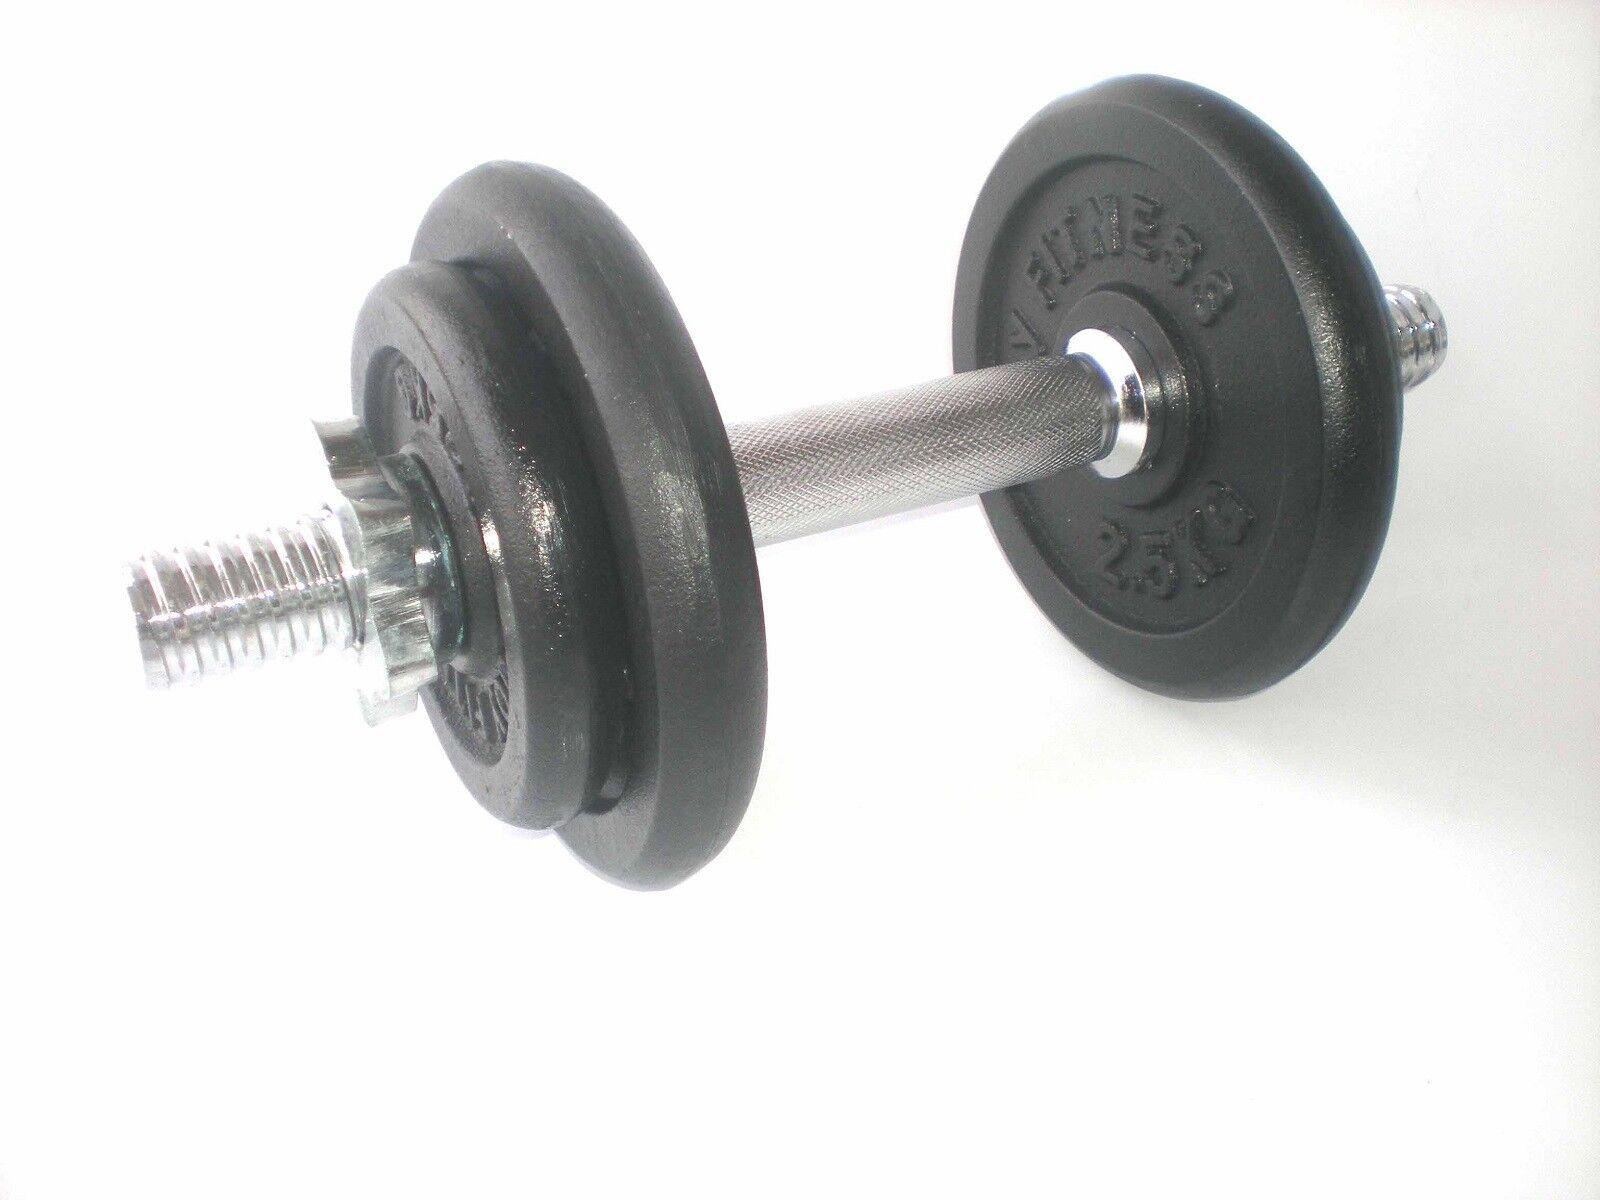 Kurzhantel Set Hantel Hantelset 10 kg Gewichte Sport Bodybuilding Krafttraining